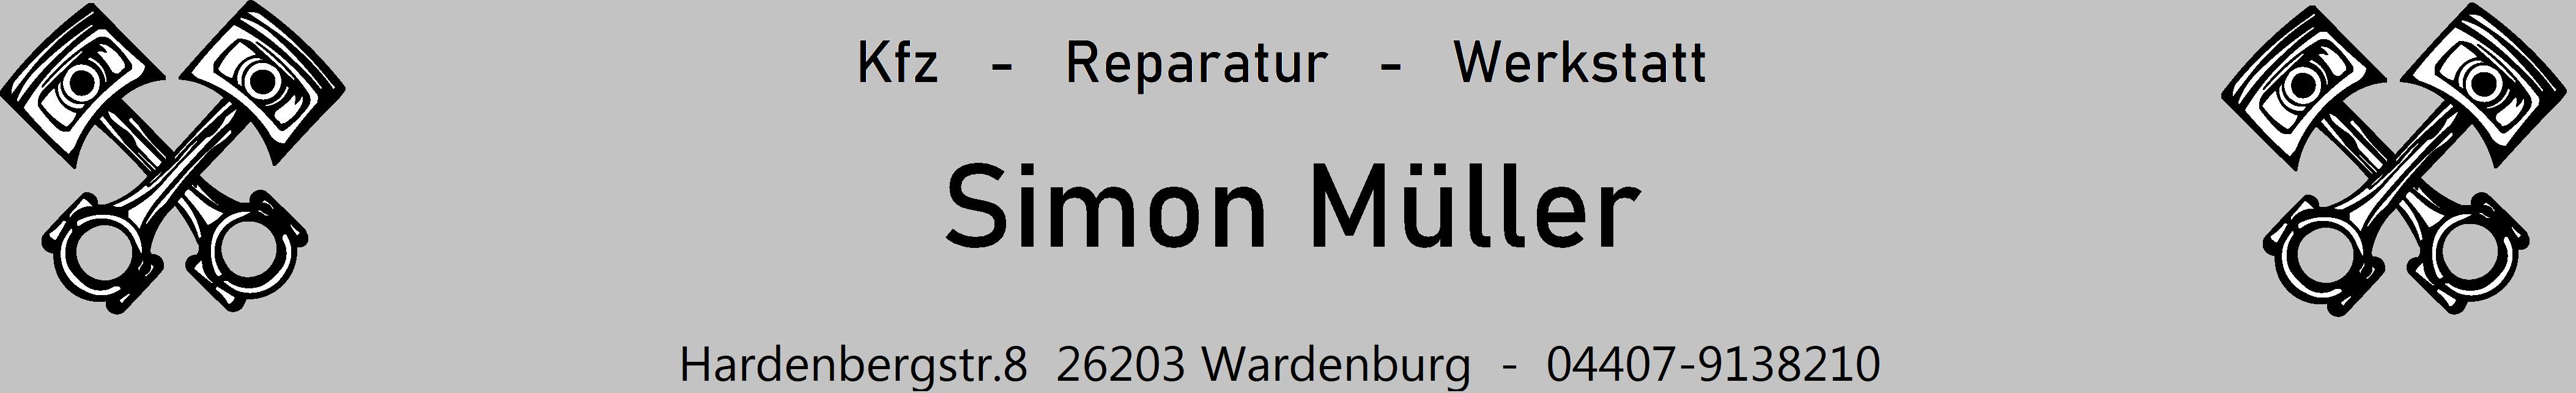 Simon Mueller    KFZ-Werkstatt-Reparatur